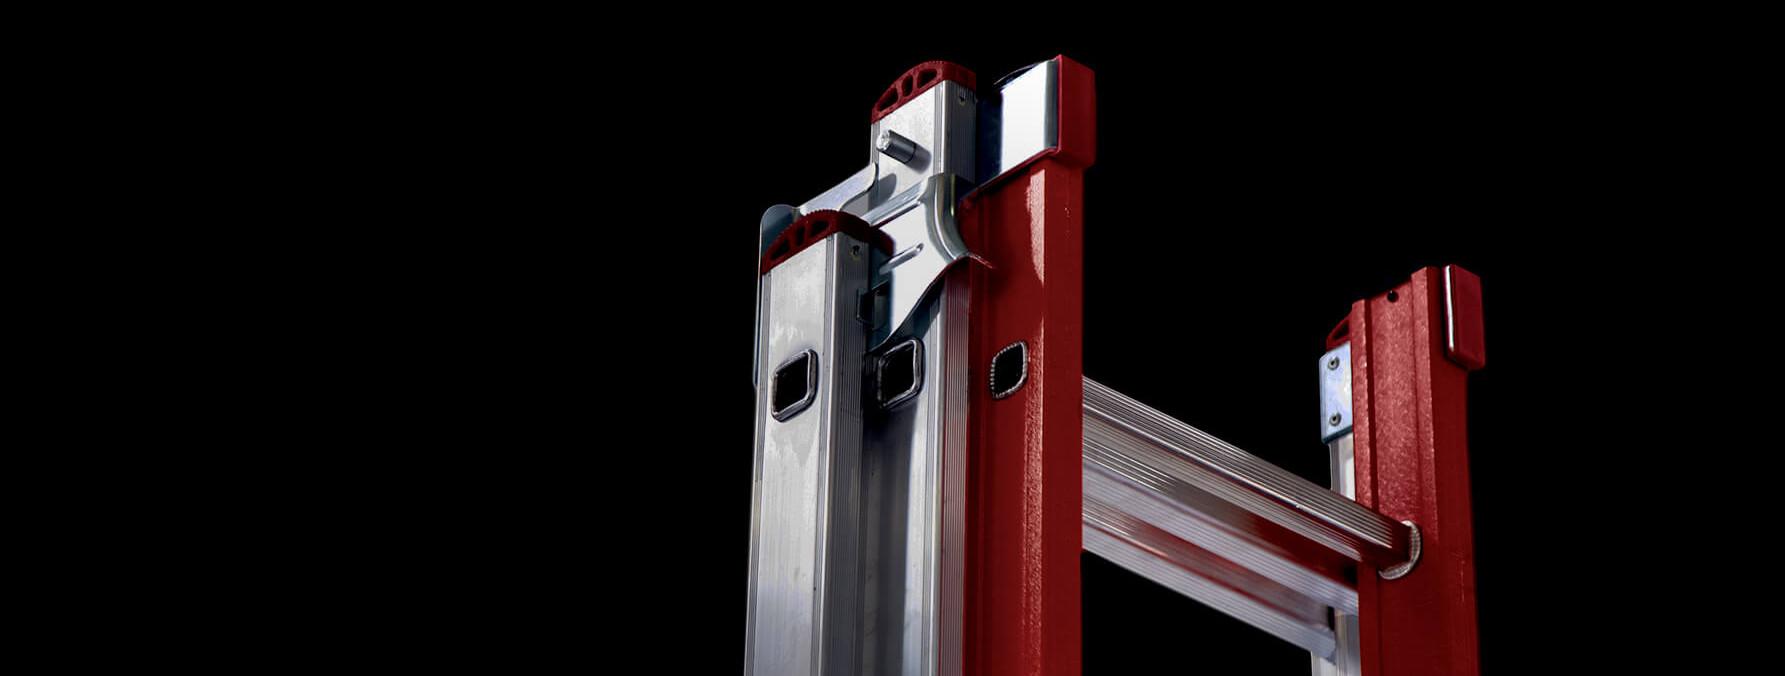 escada-ultima-parte-fibra-3-jormax-aluminio-metal